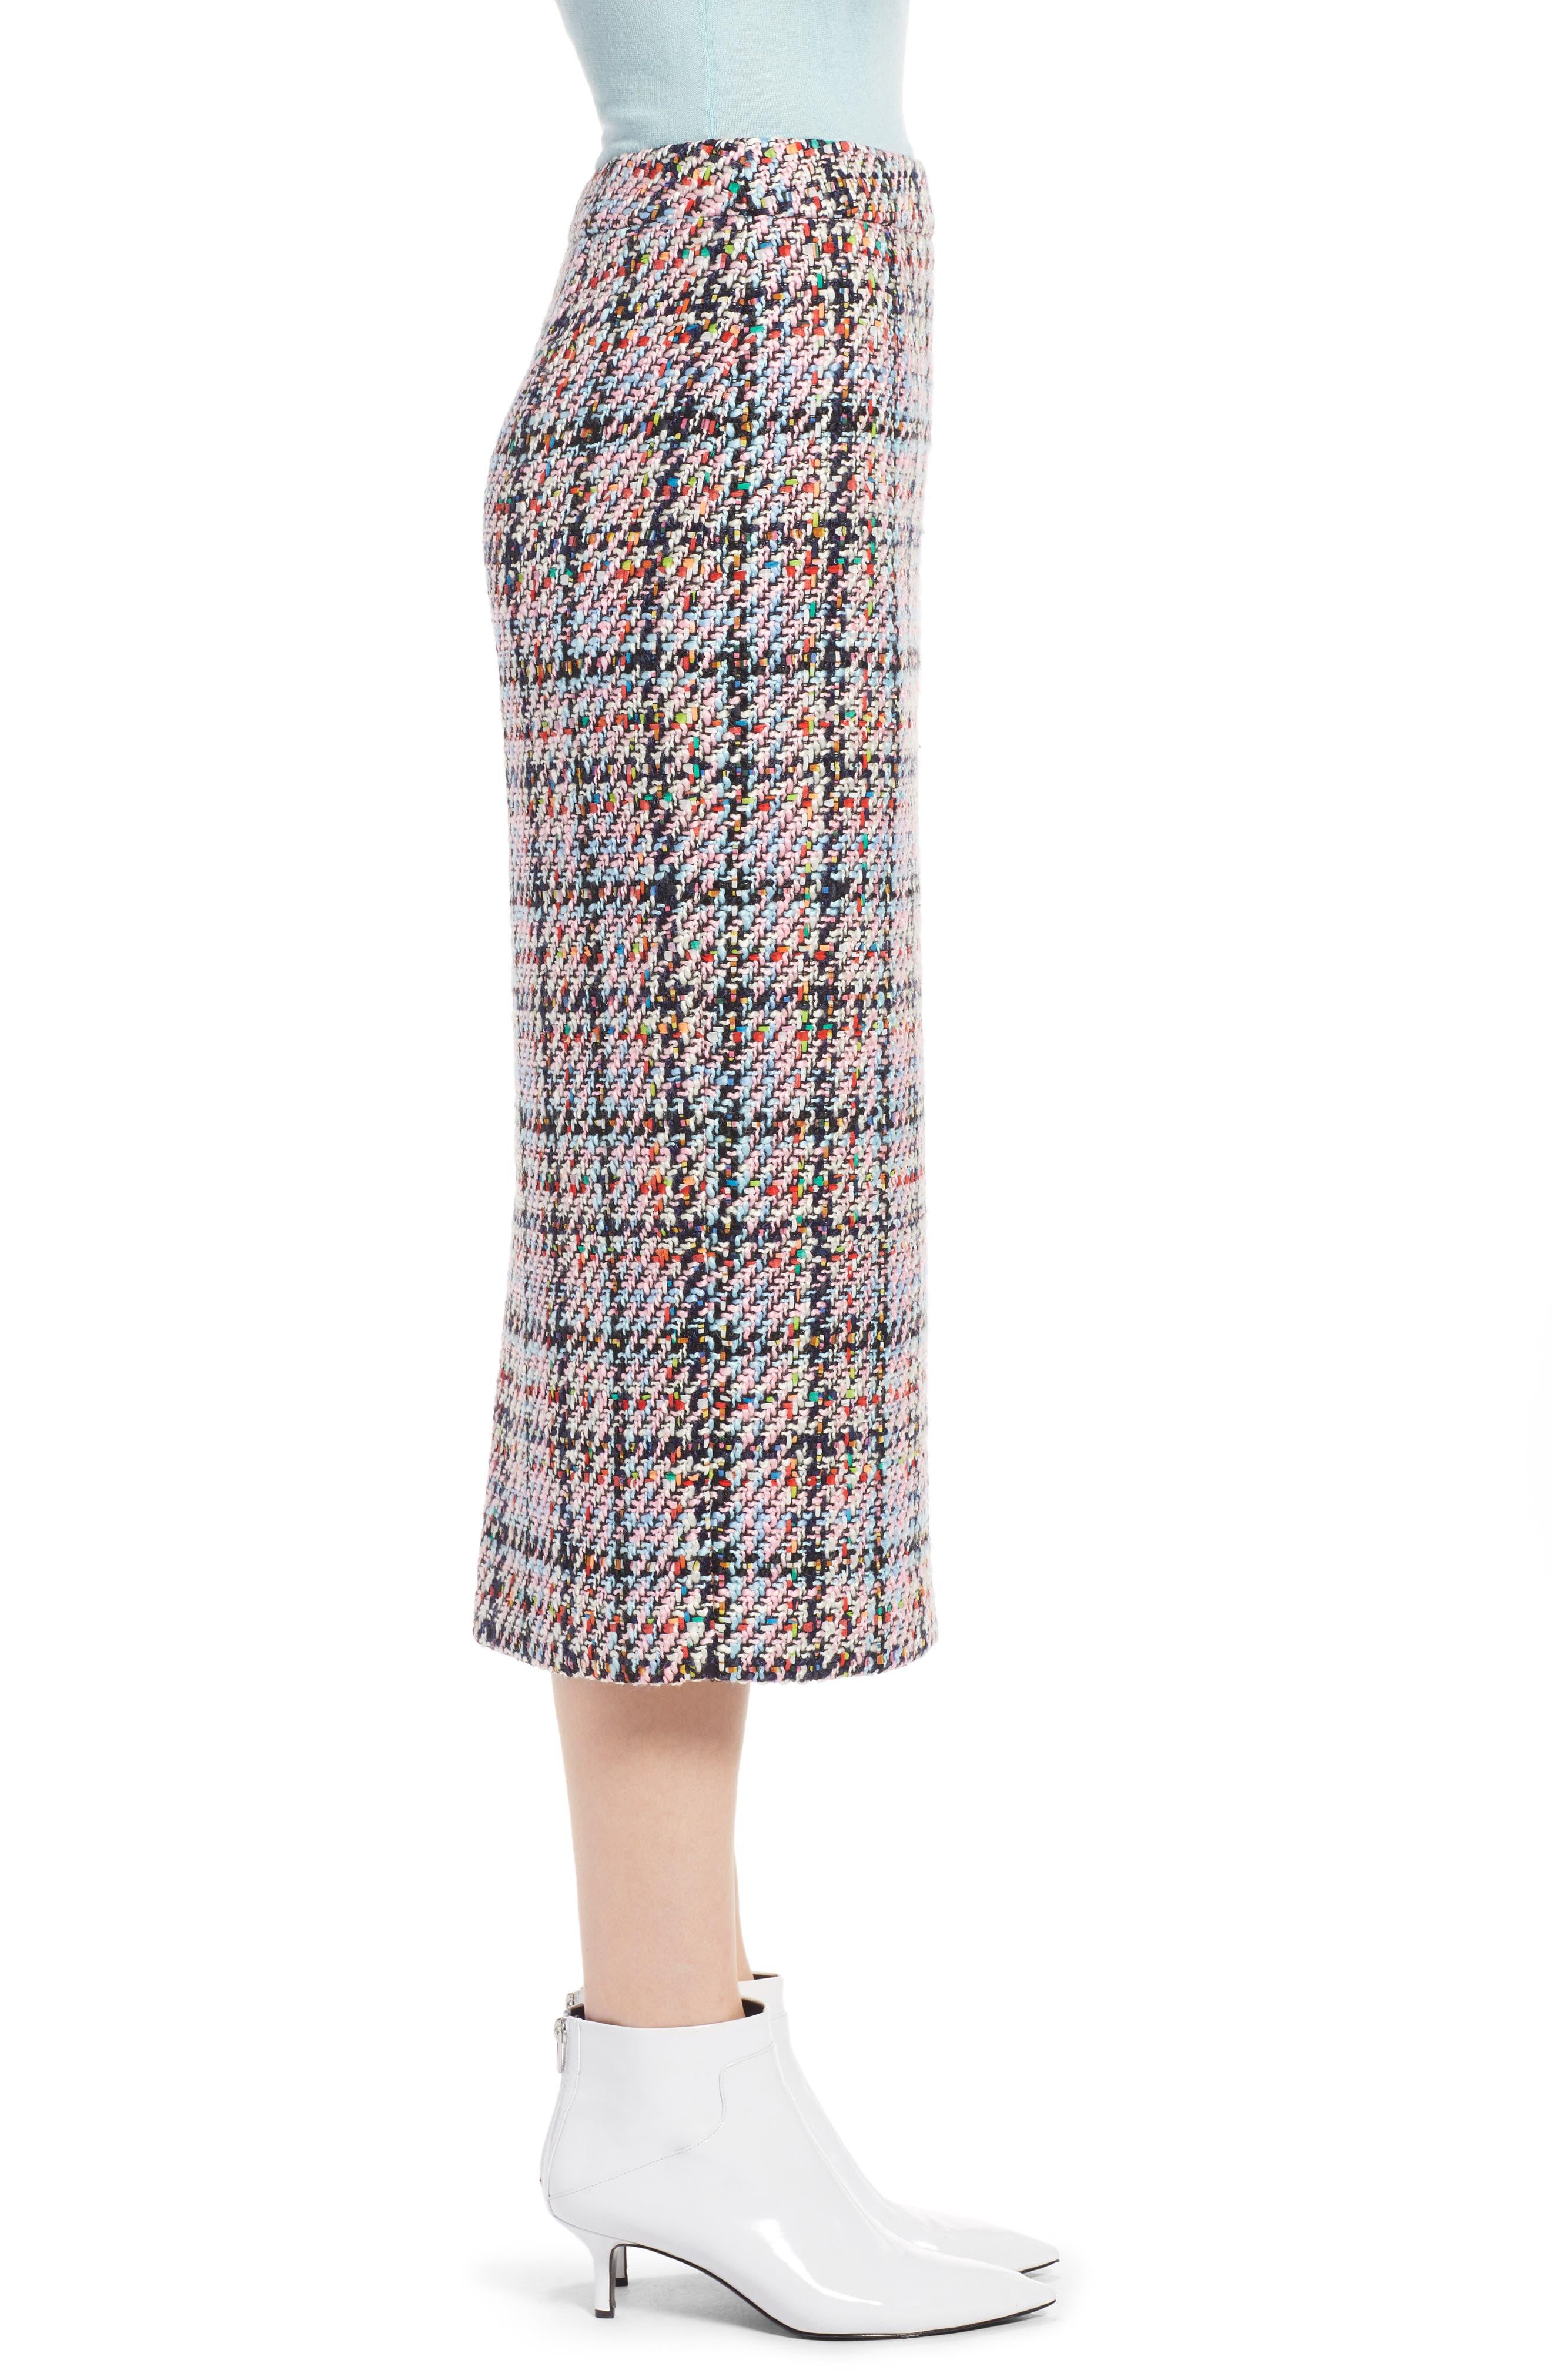 Tweed Midi Skirt,                             Alternate thumbnail 3, color,                             Pink Multi Tweed